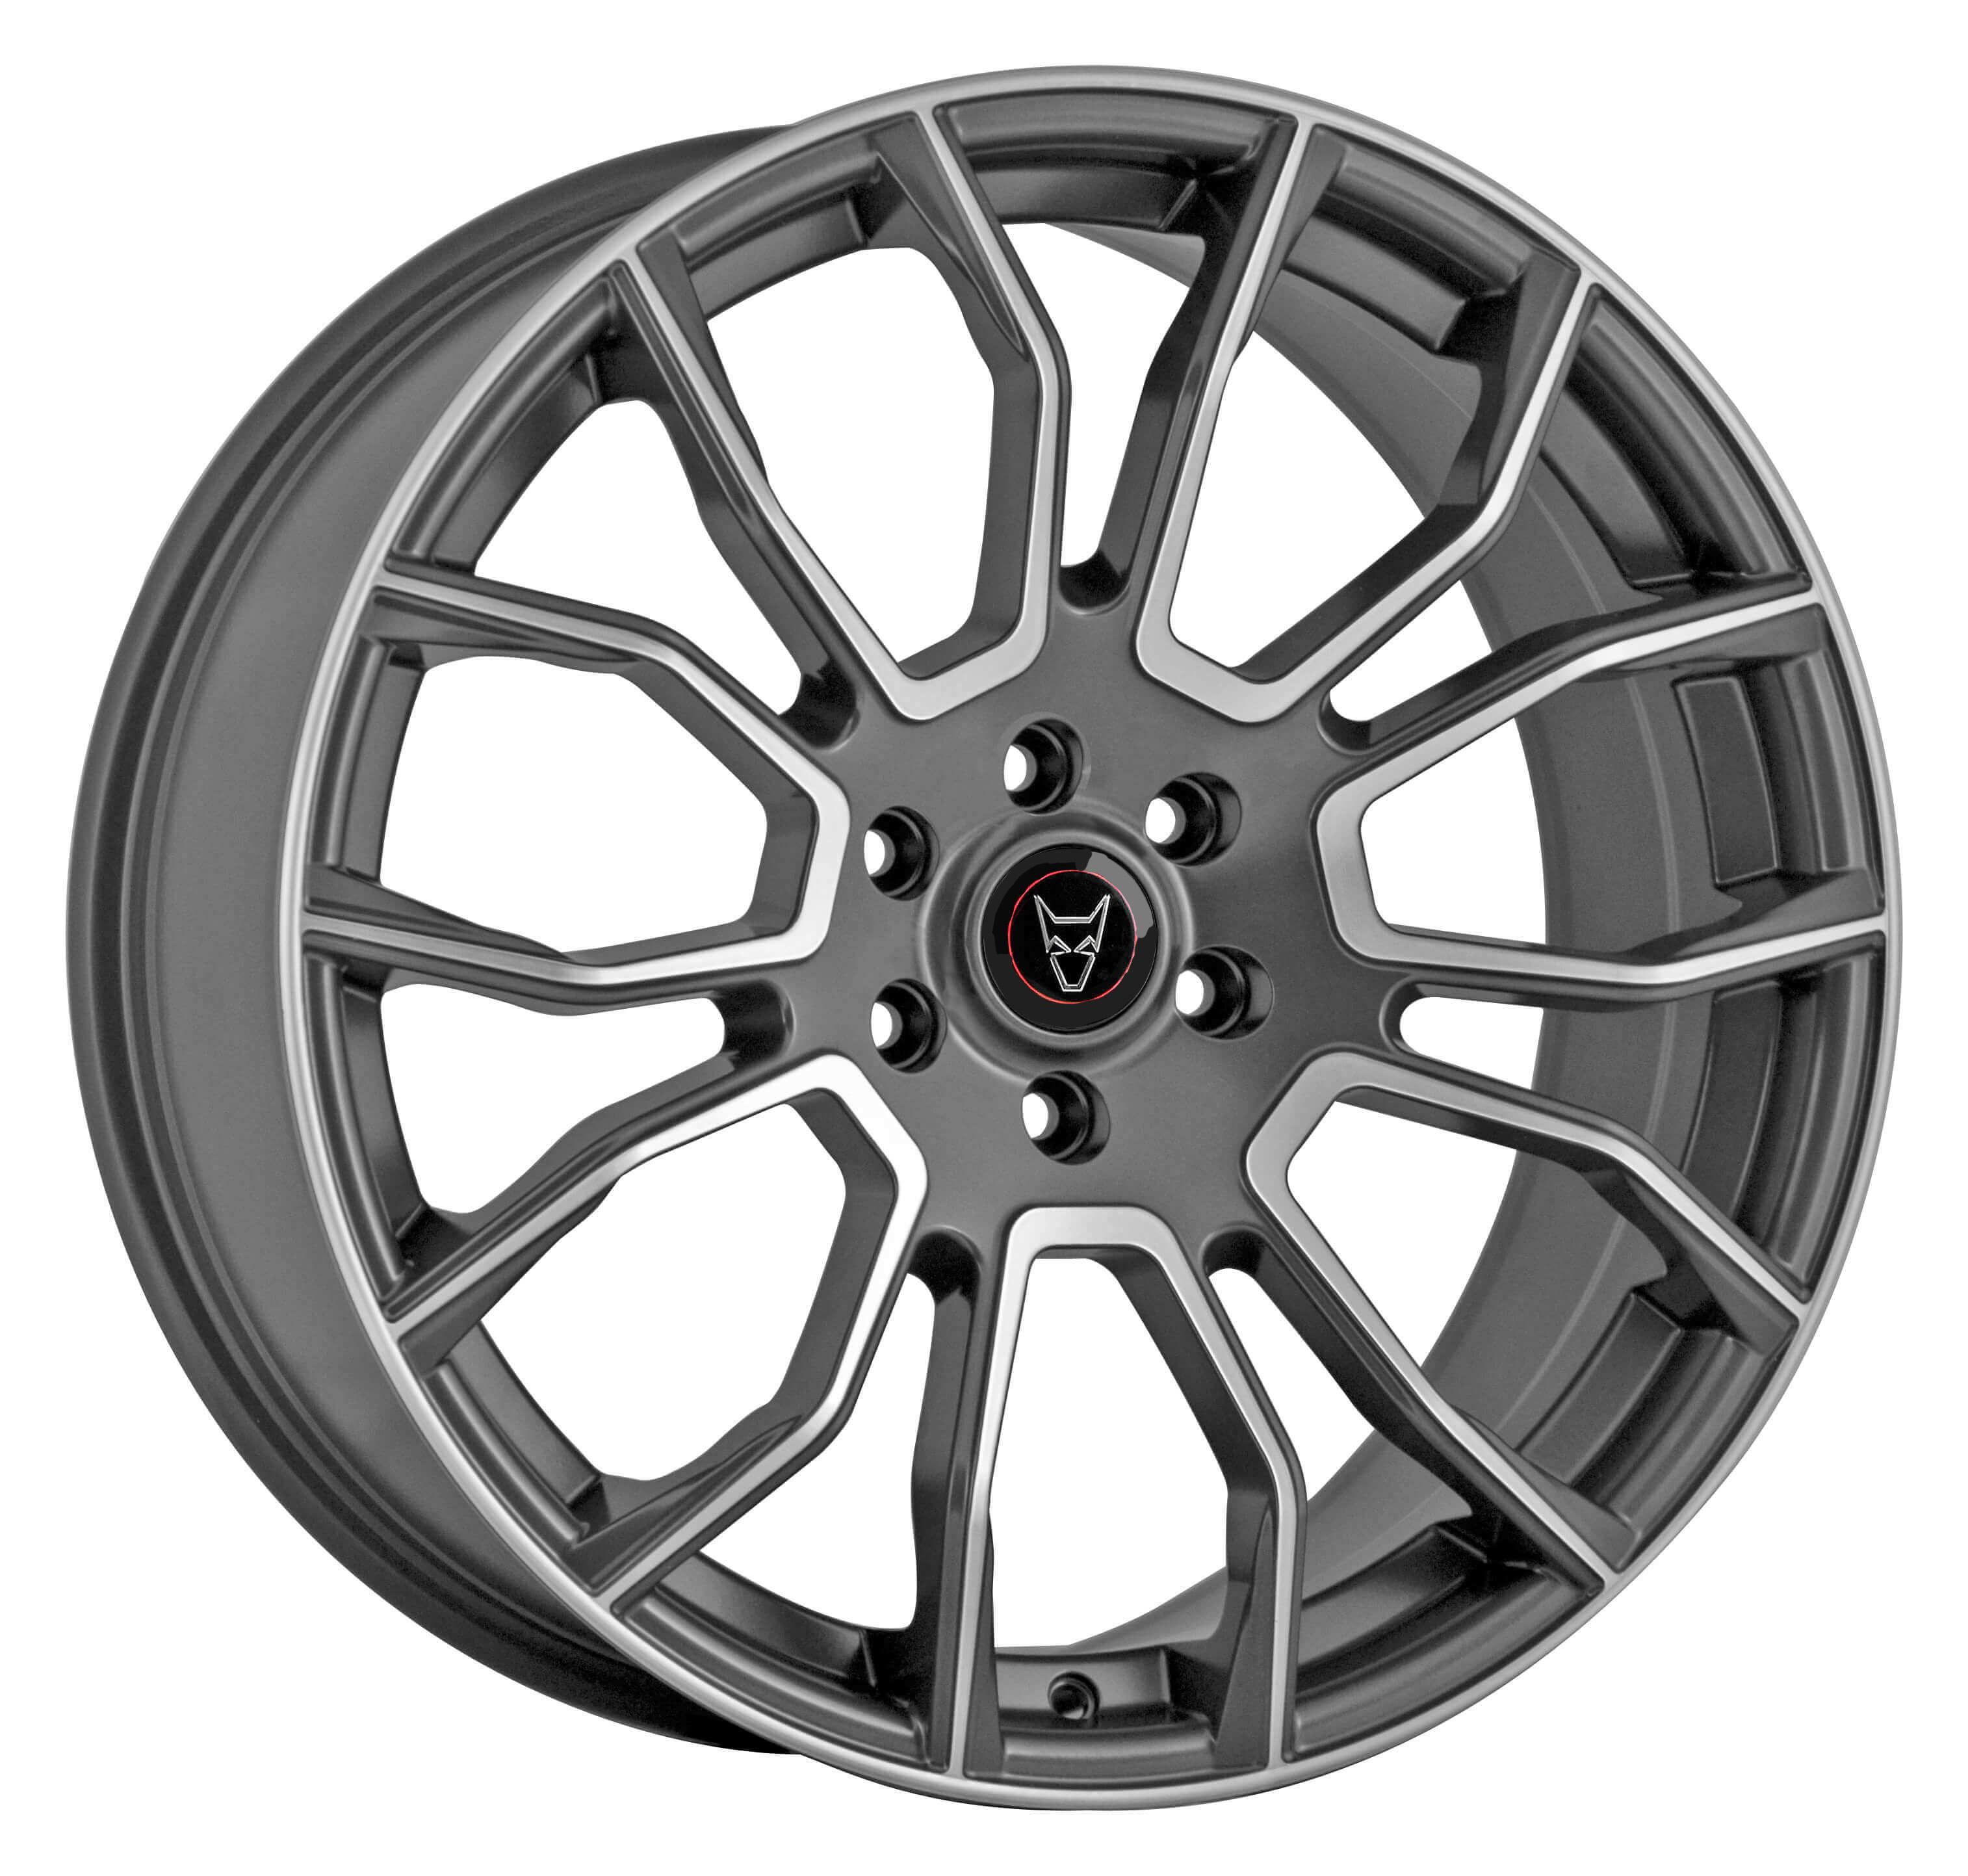 Demon Wheels Eurosport Evoke X Gunmetal Polished